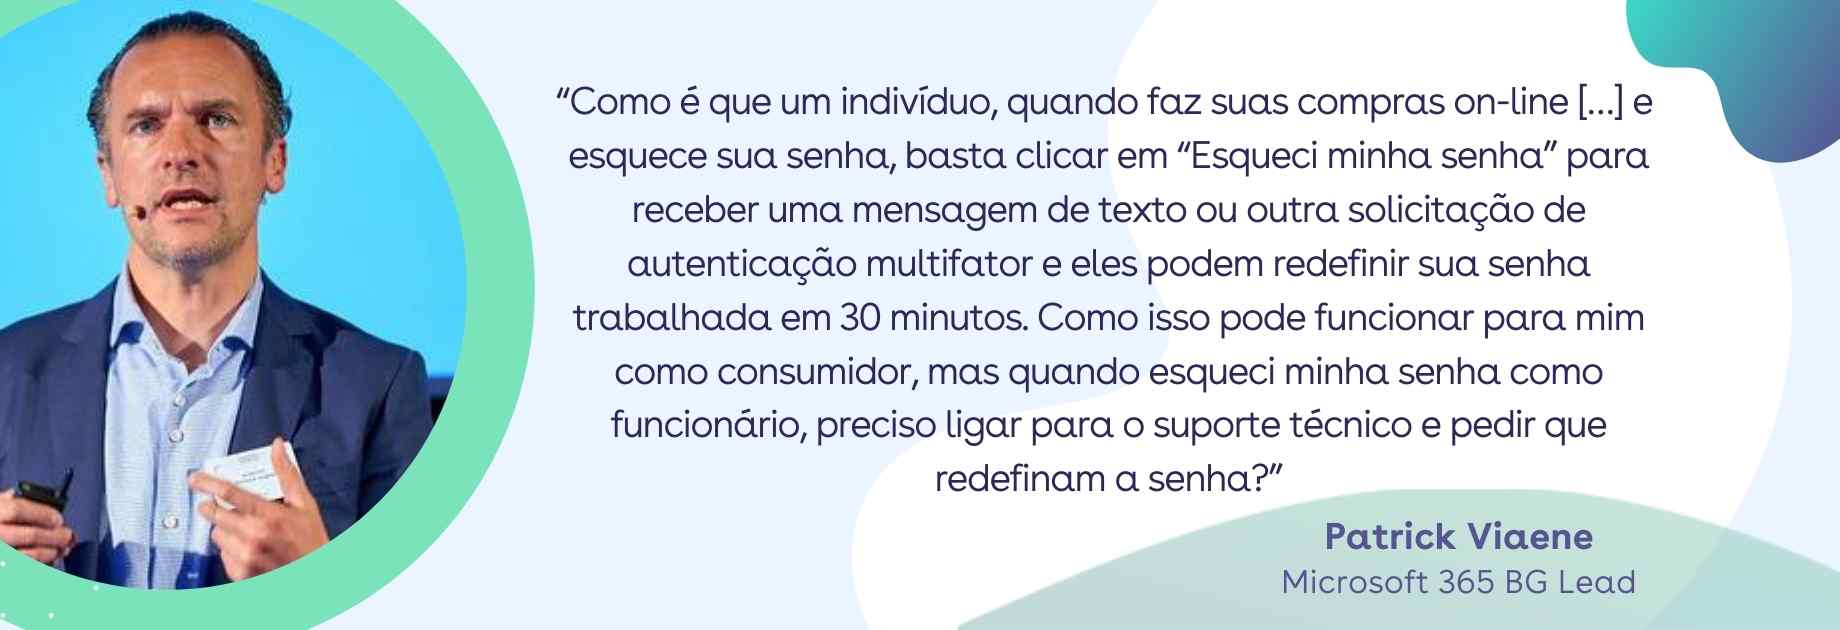 Quote Patrick Viaene